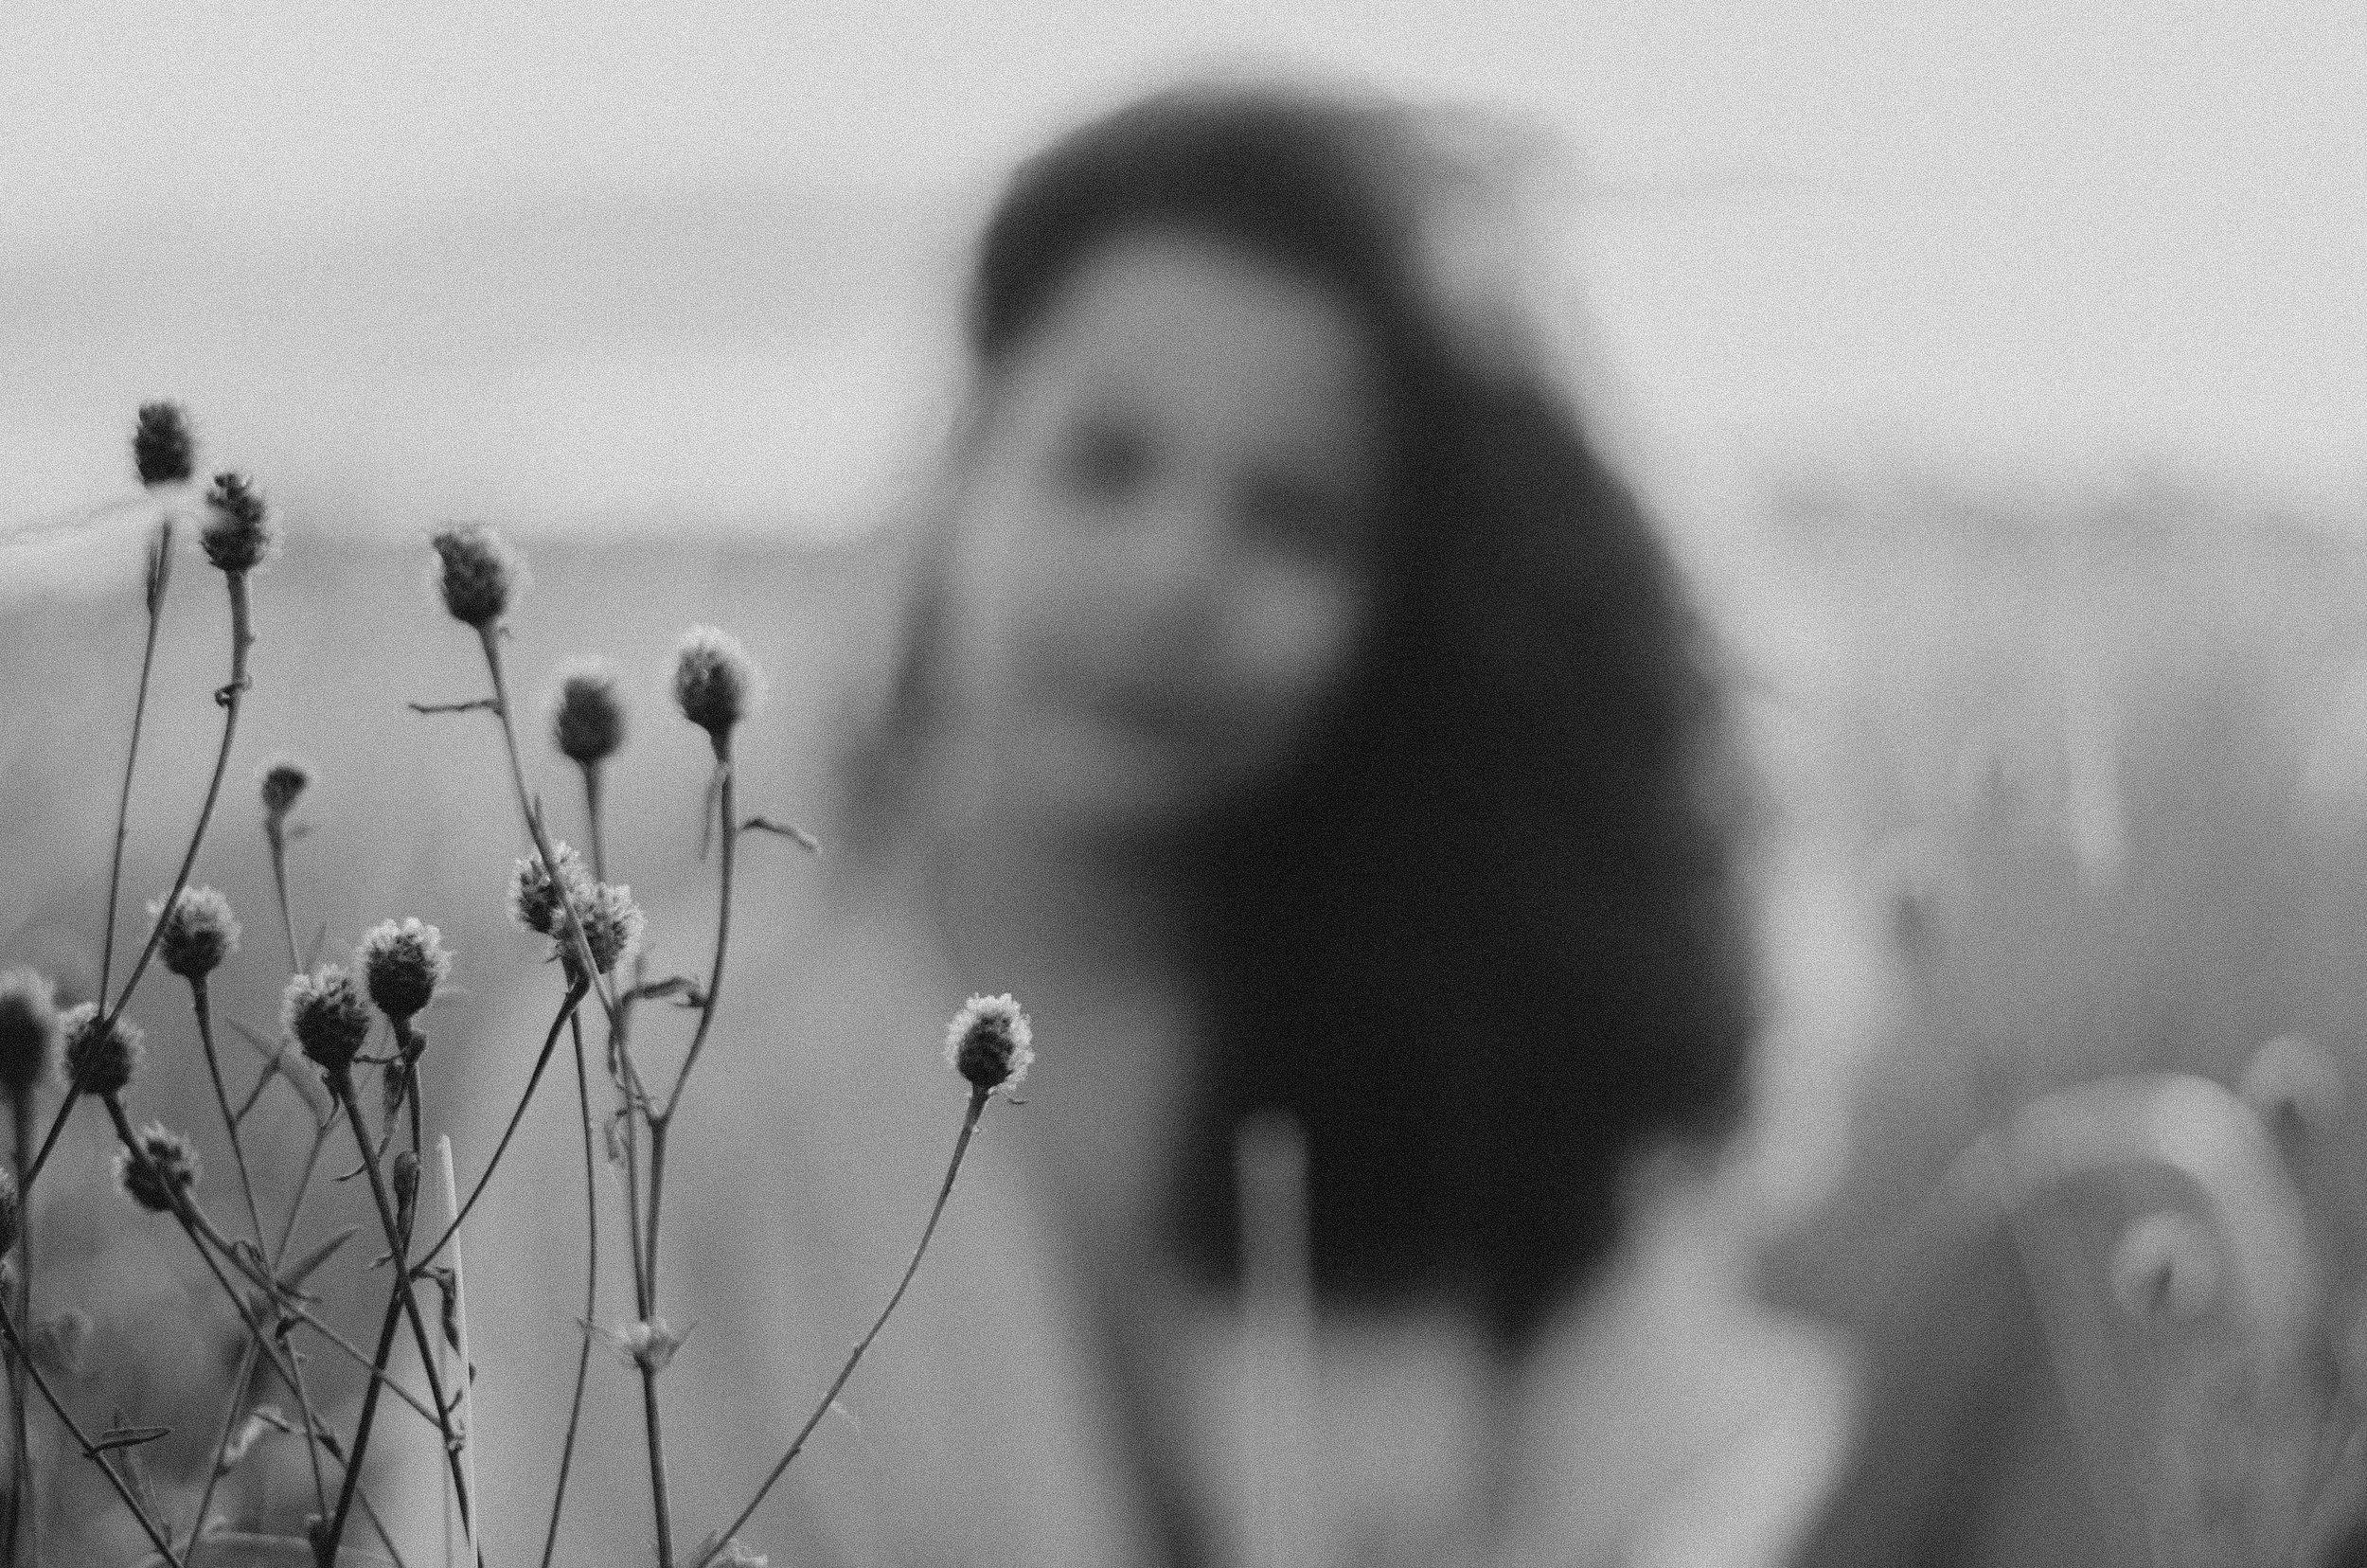 Inka-Portrait-Session-Aiste-Saulyte-Photography-17-07-30-360.jpg